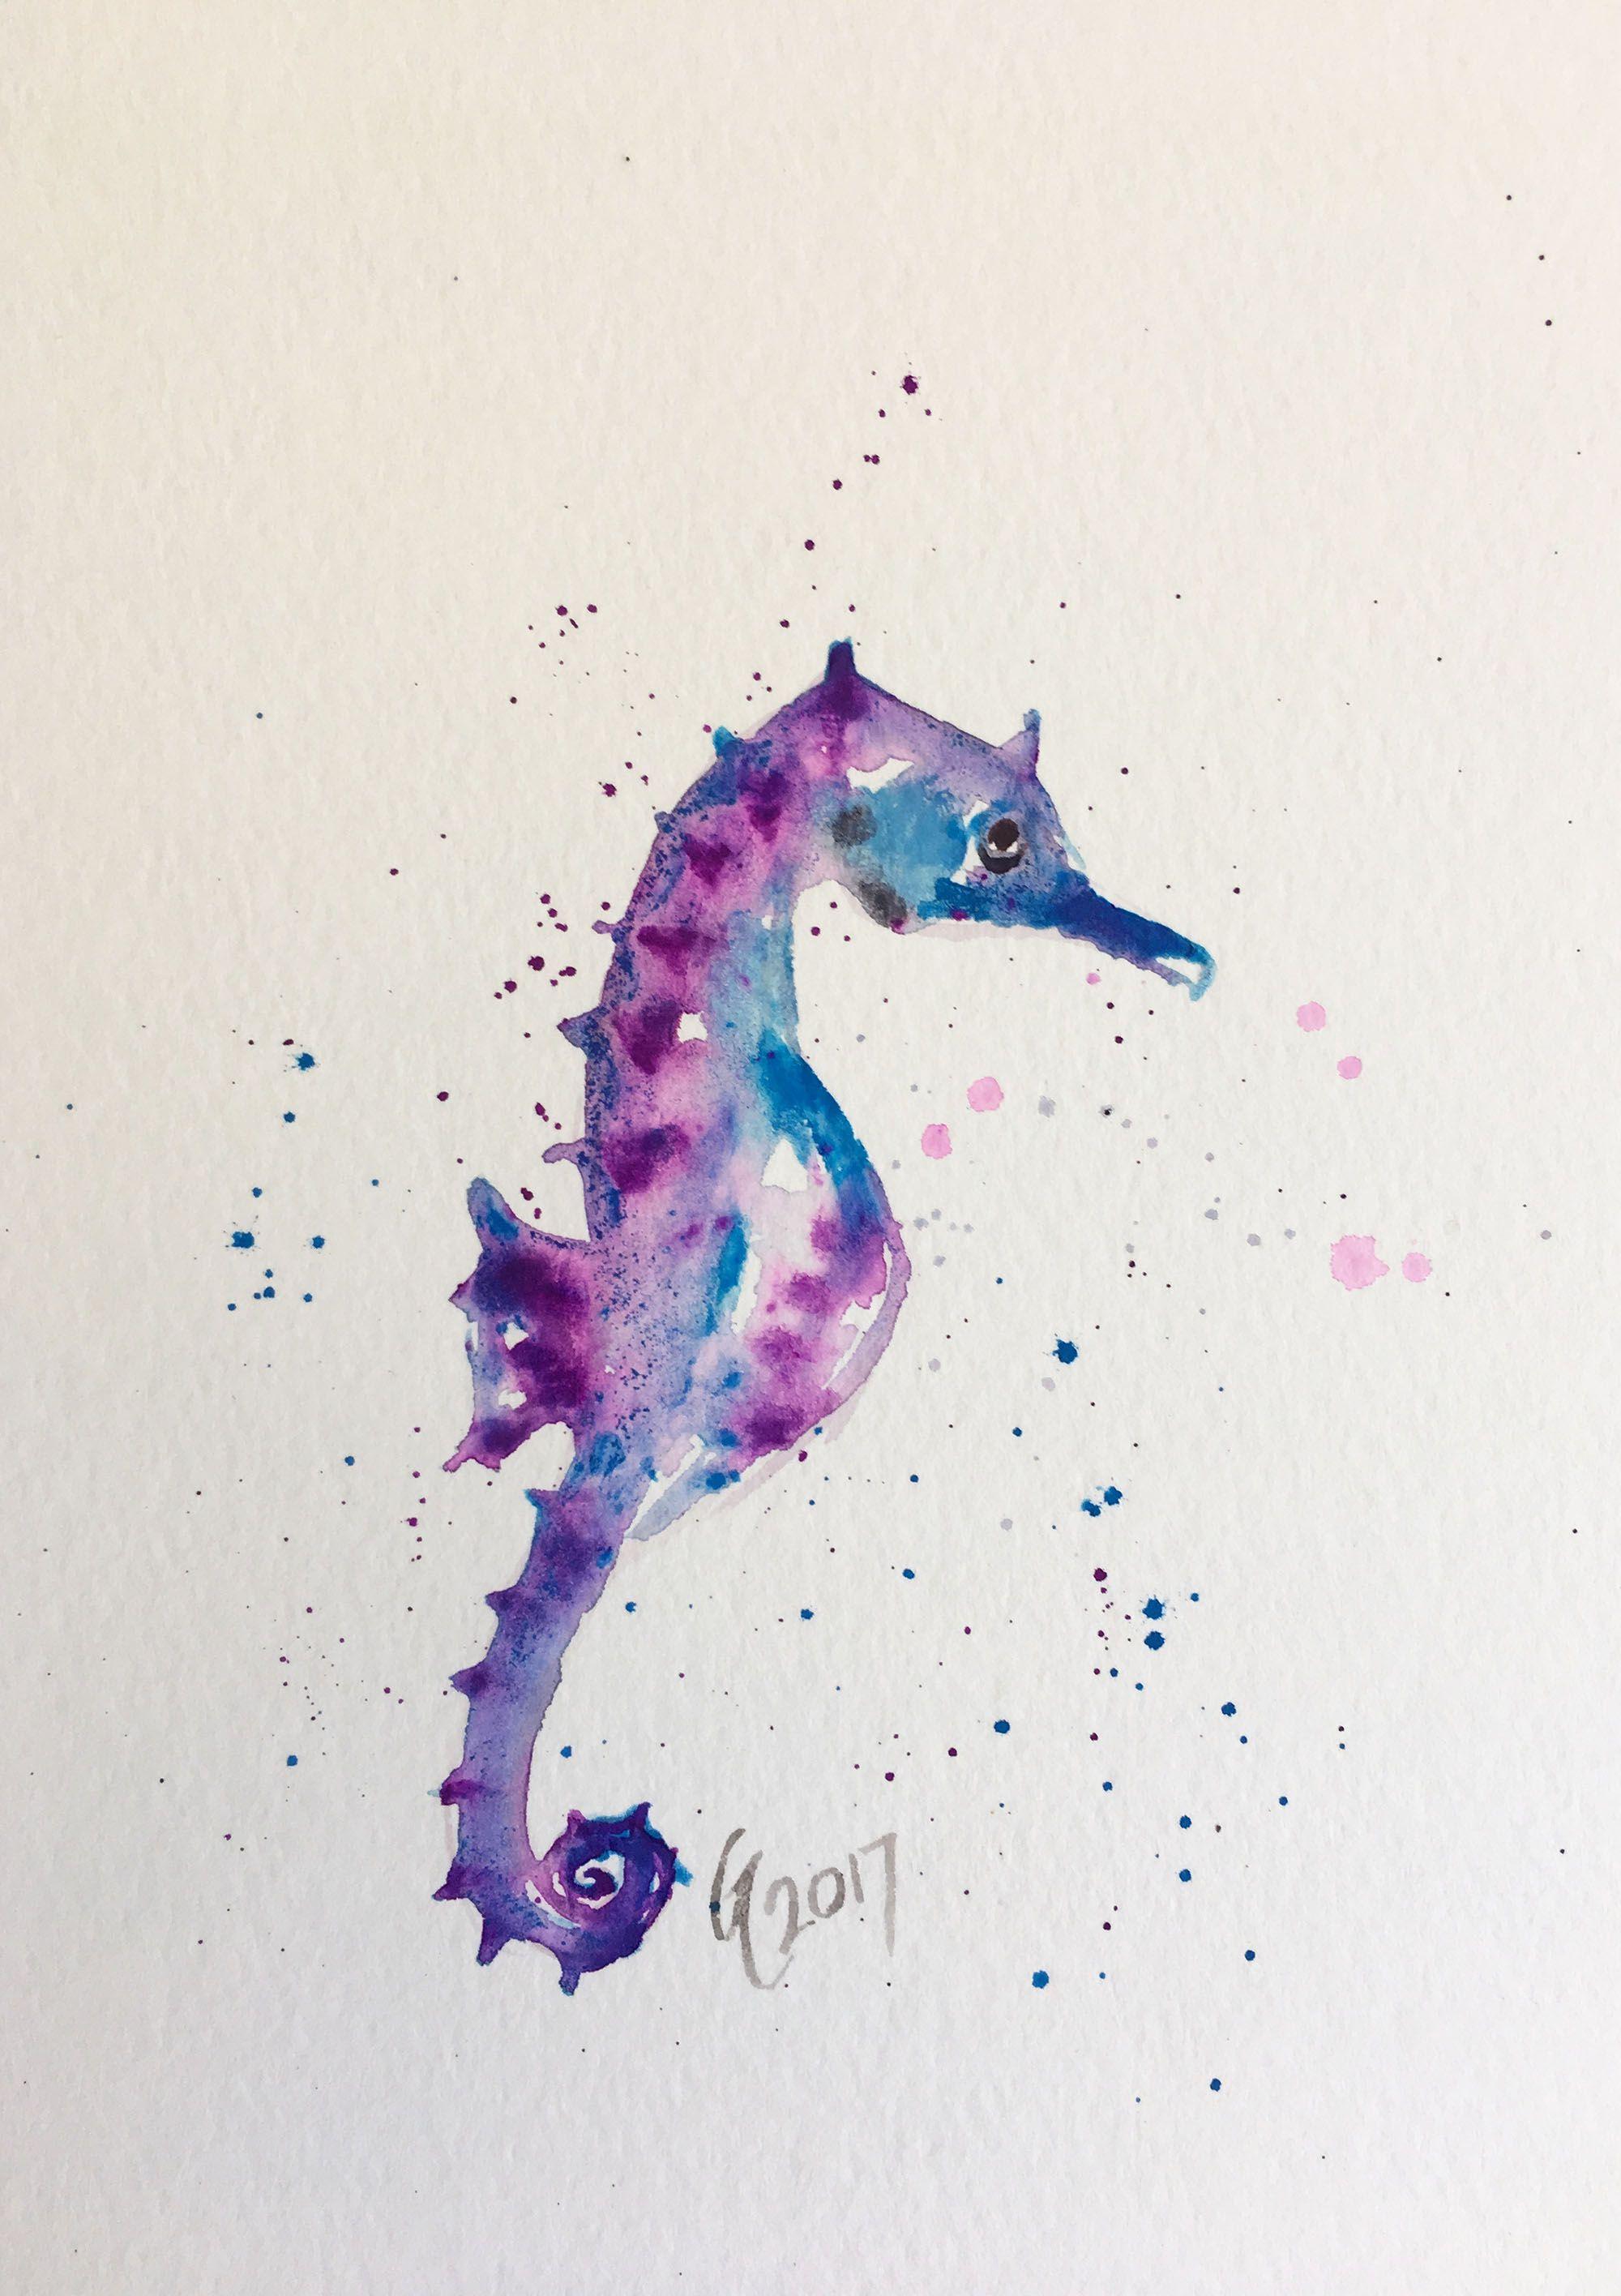 seahorse fish painting horse watercolor original home art decor sea beach